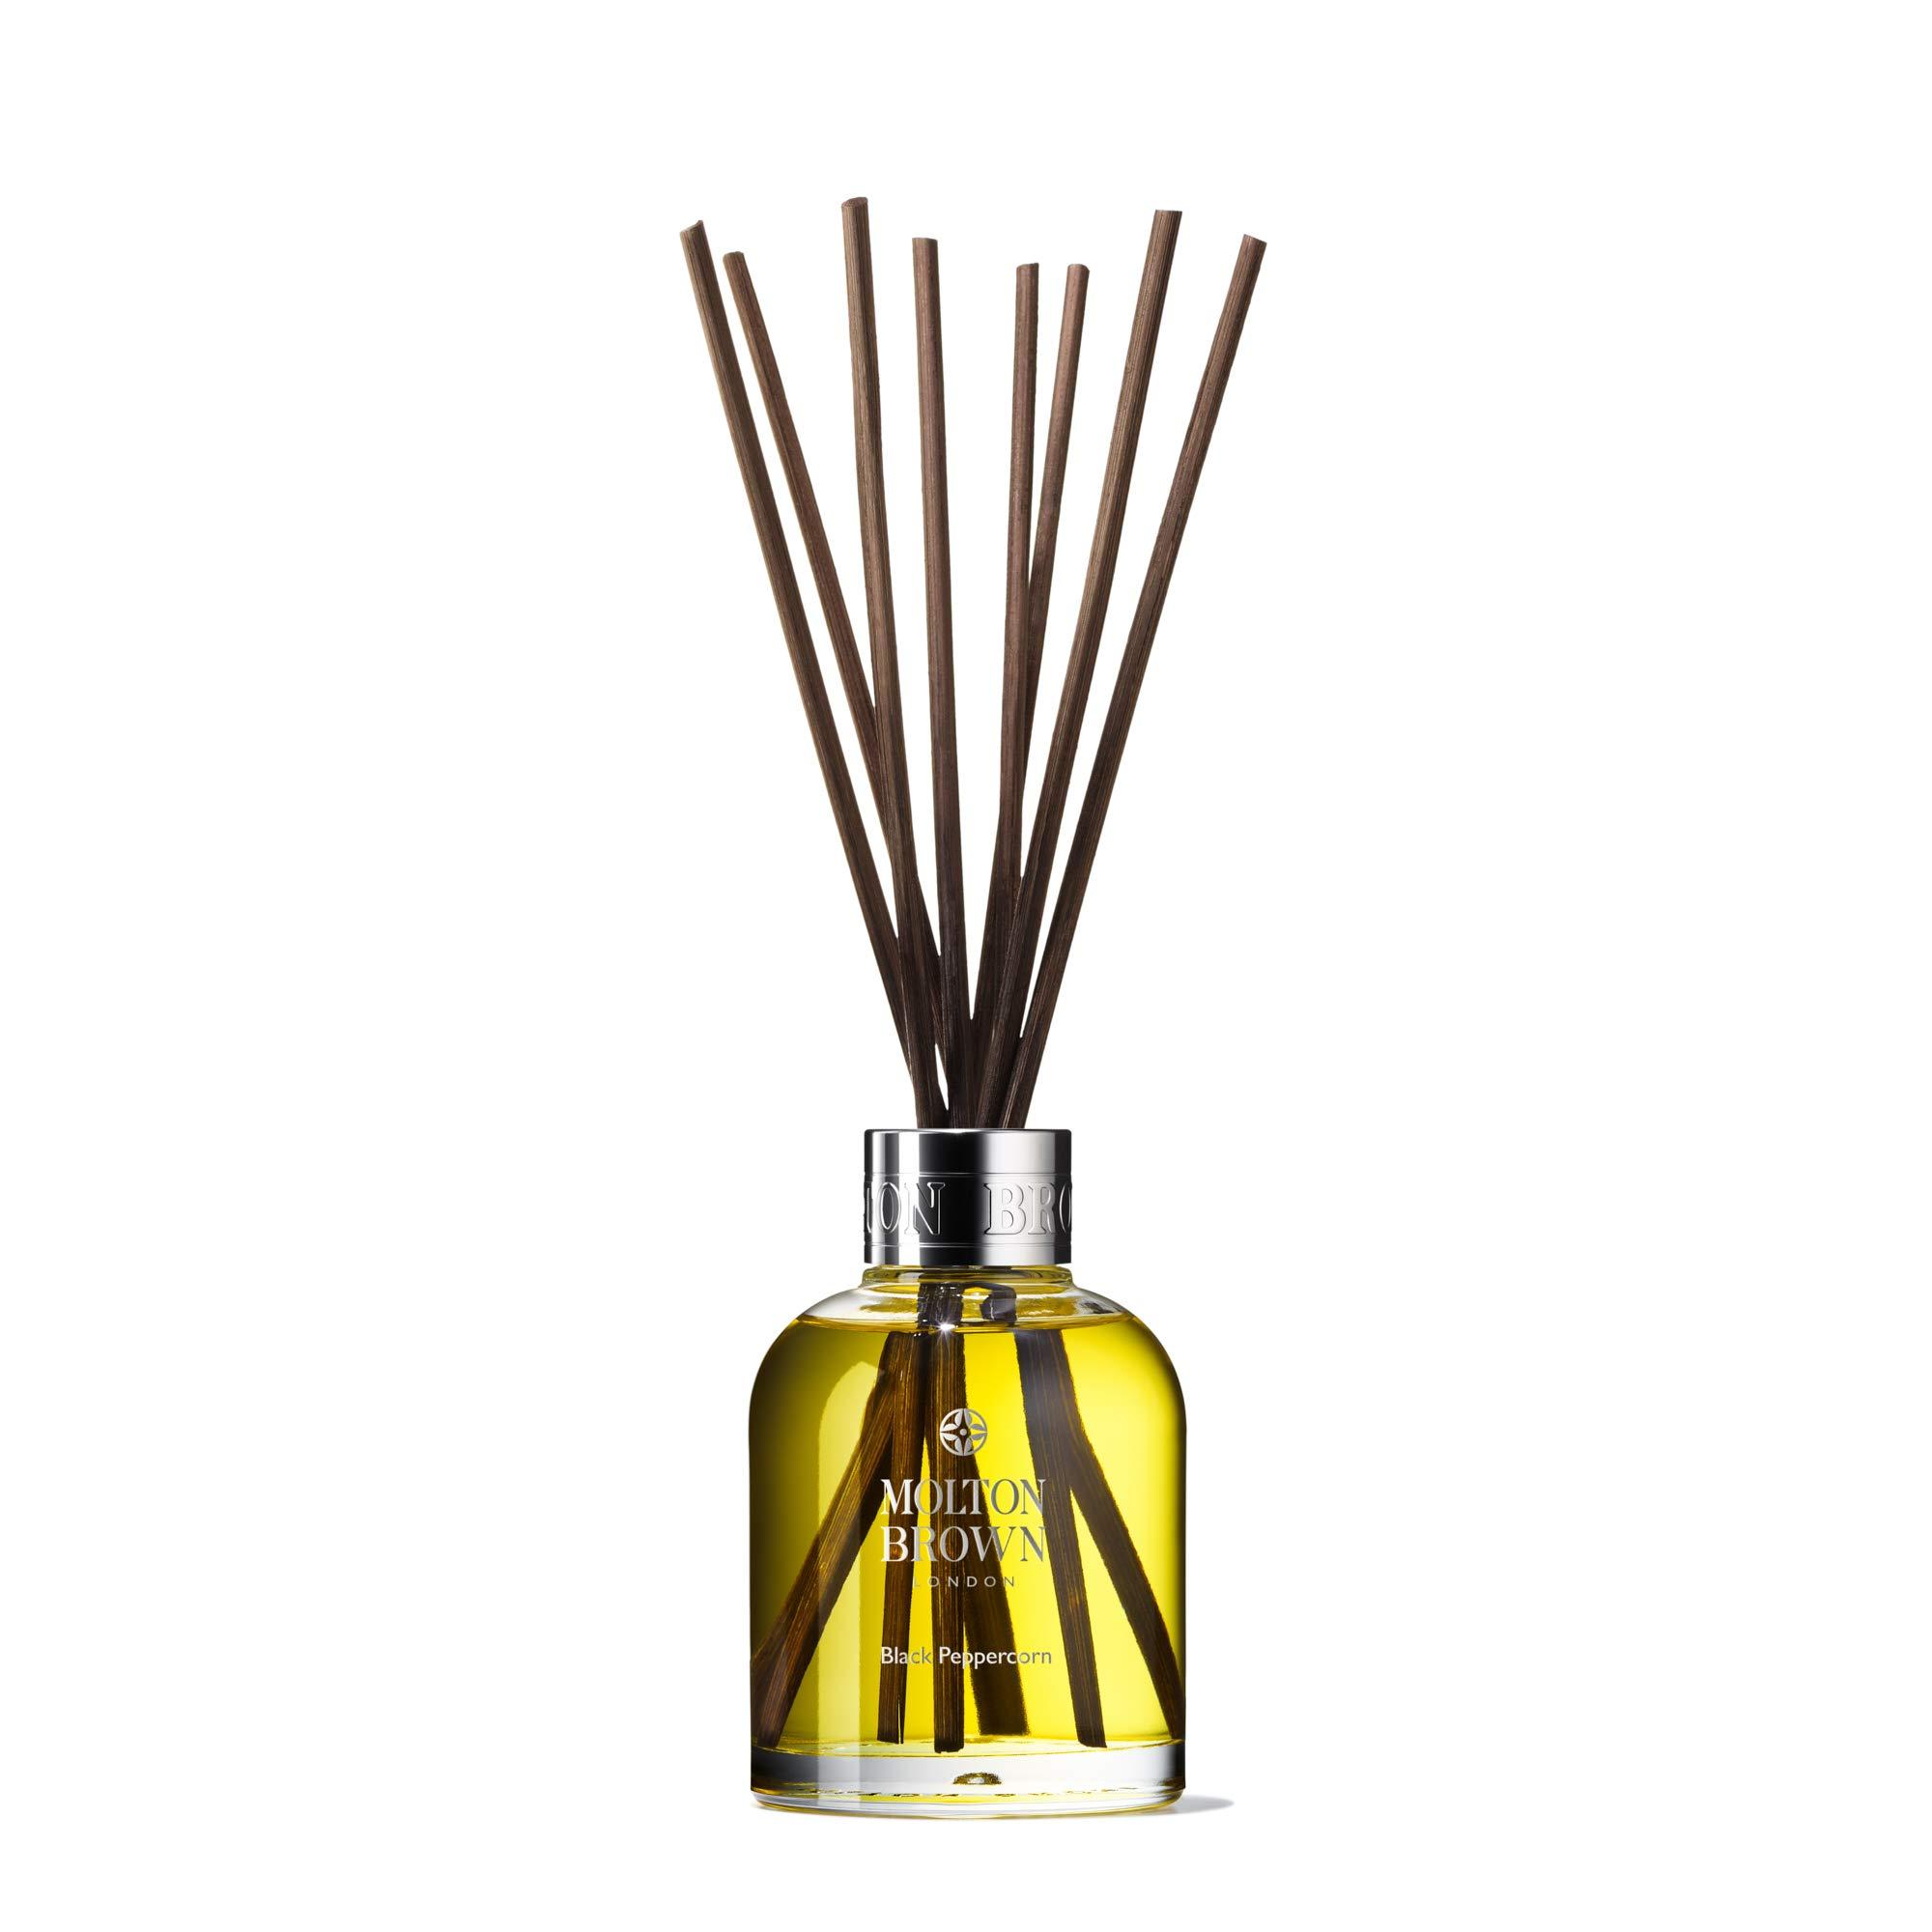 Molton Brown Aroma Reeds, Black Peppercorn, 5 Fl Oz